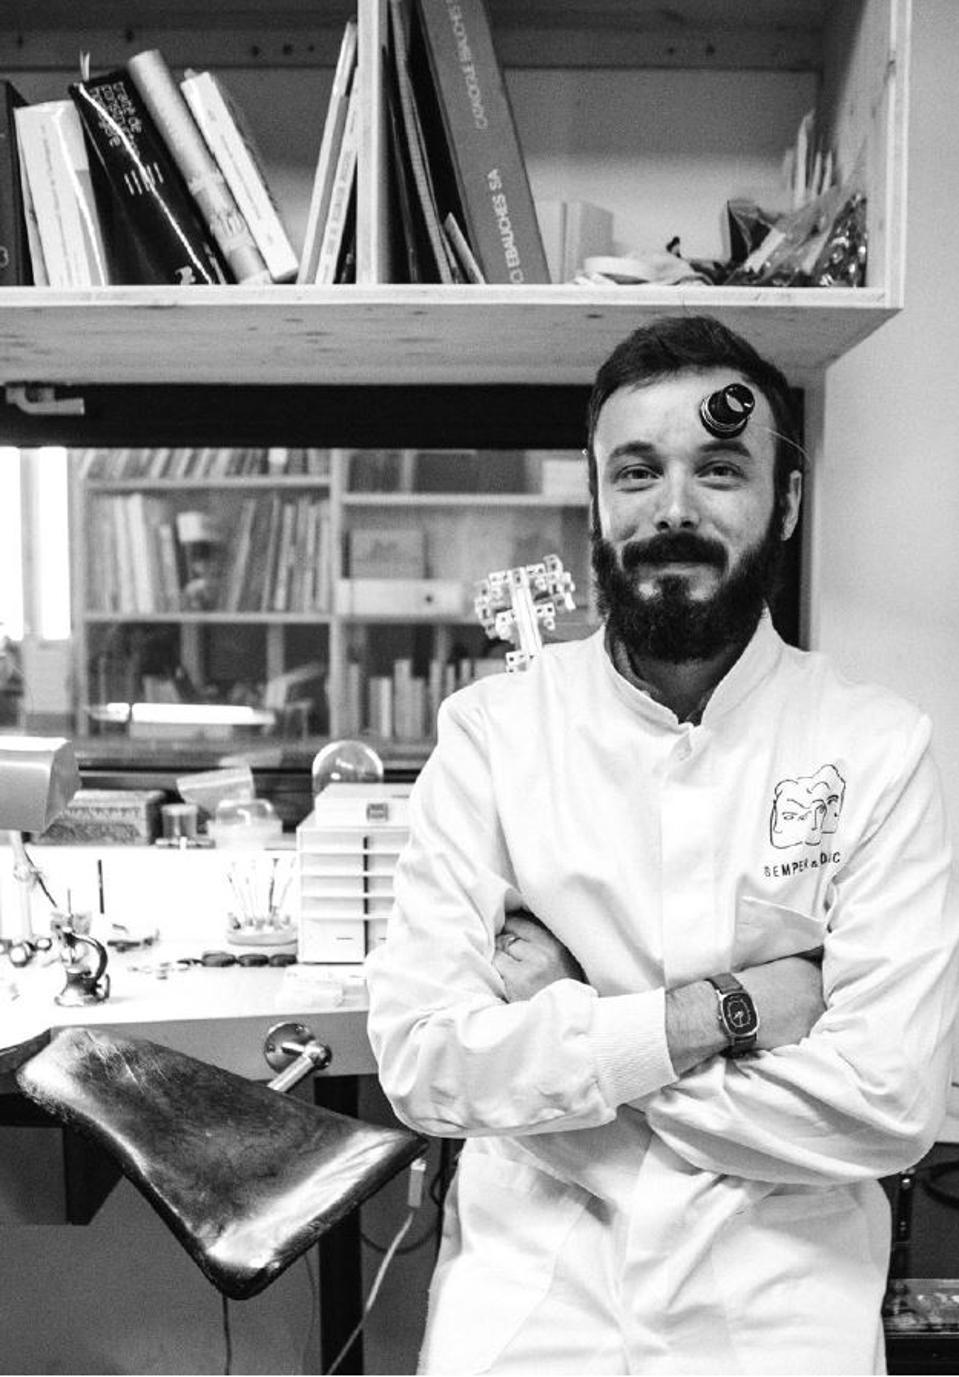 Colin de Tonnac, founder of Semper & Adhuc based in Bordeaux, France.